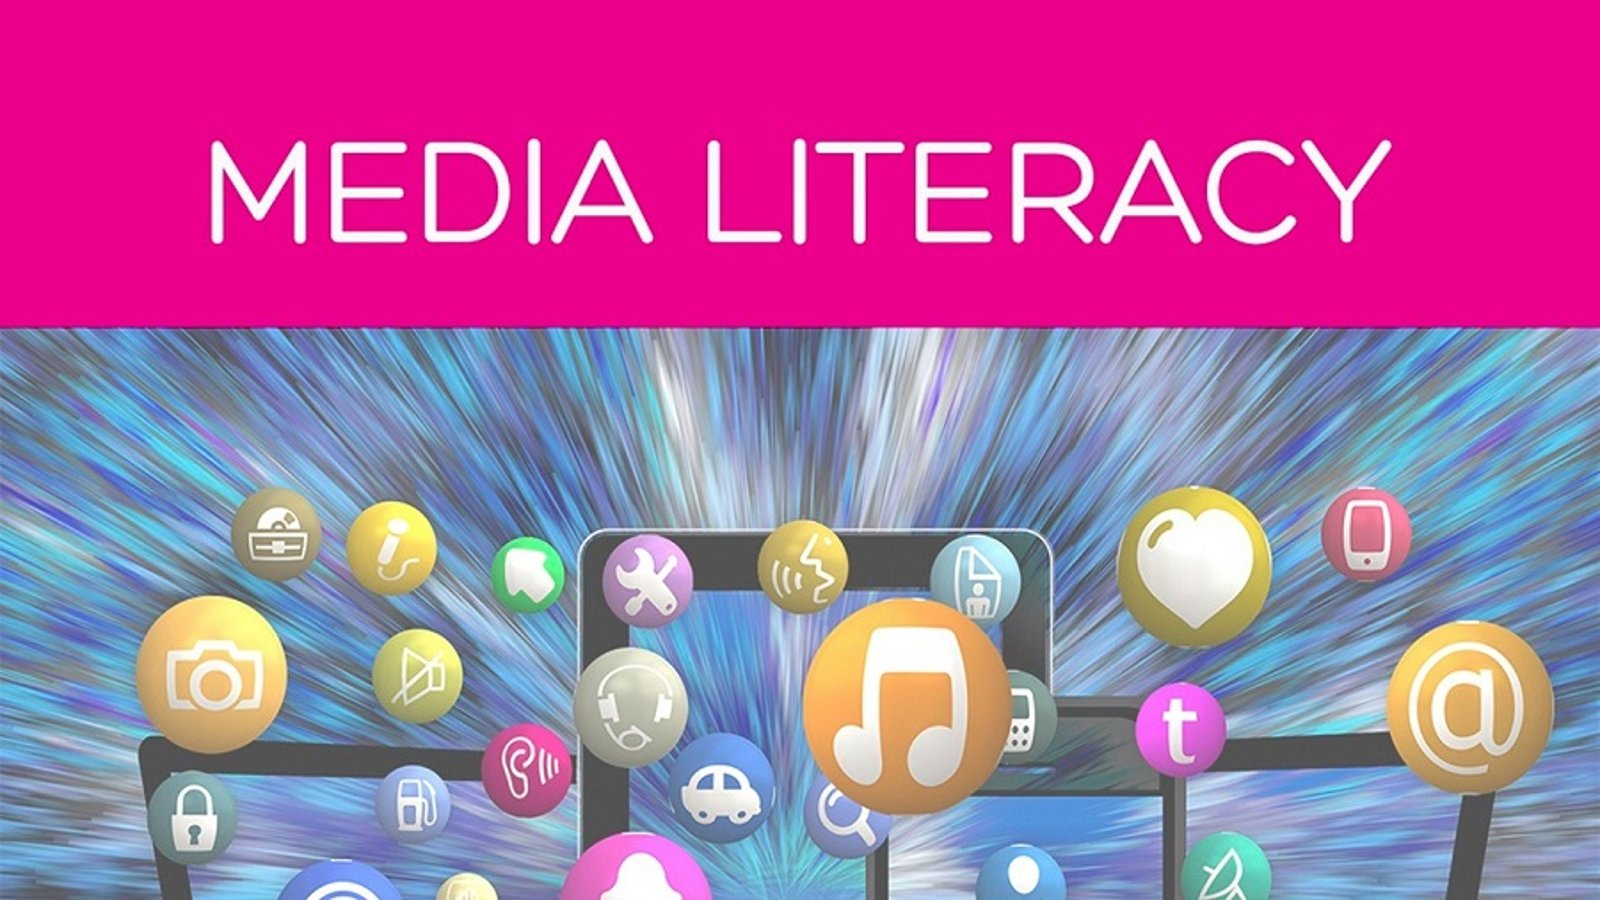 Media Literacy: Media Ethics